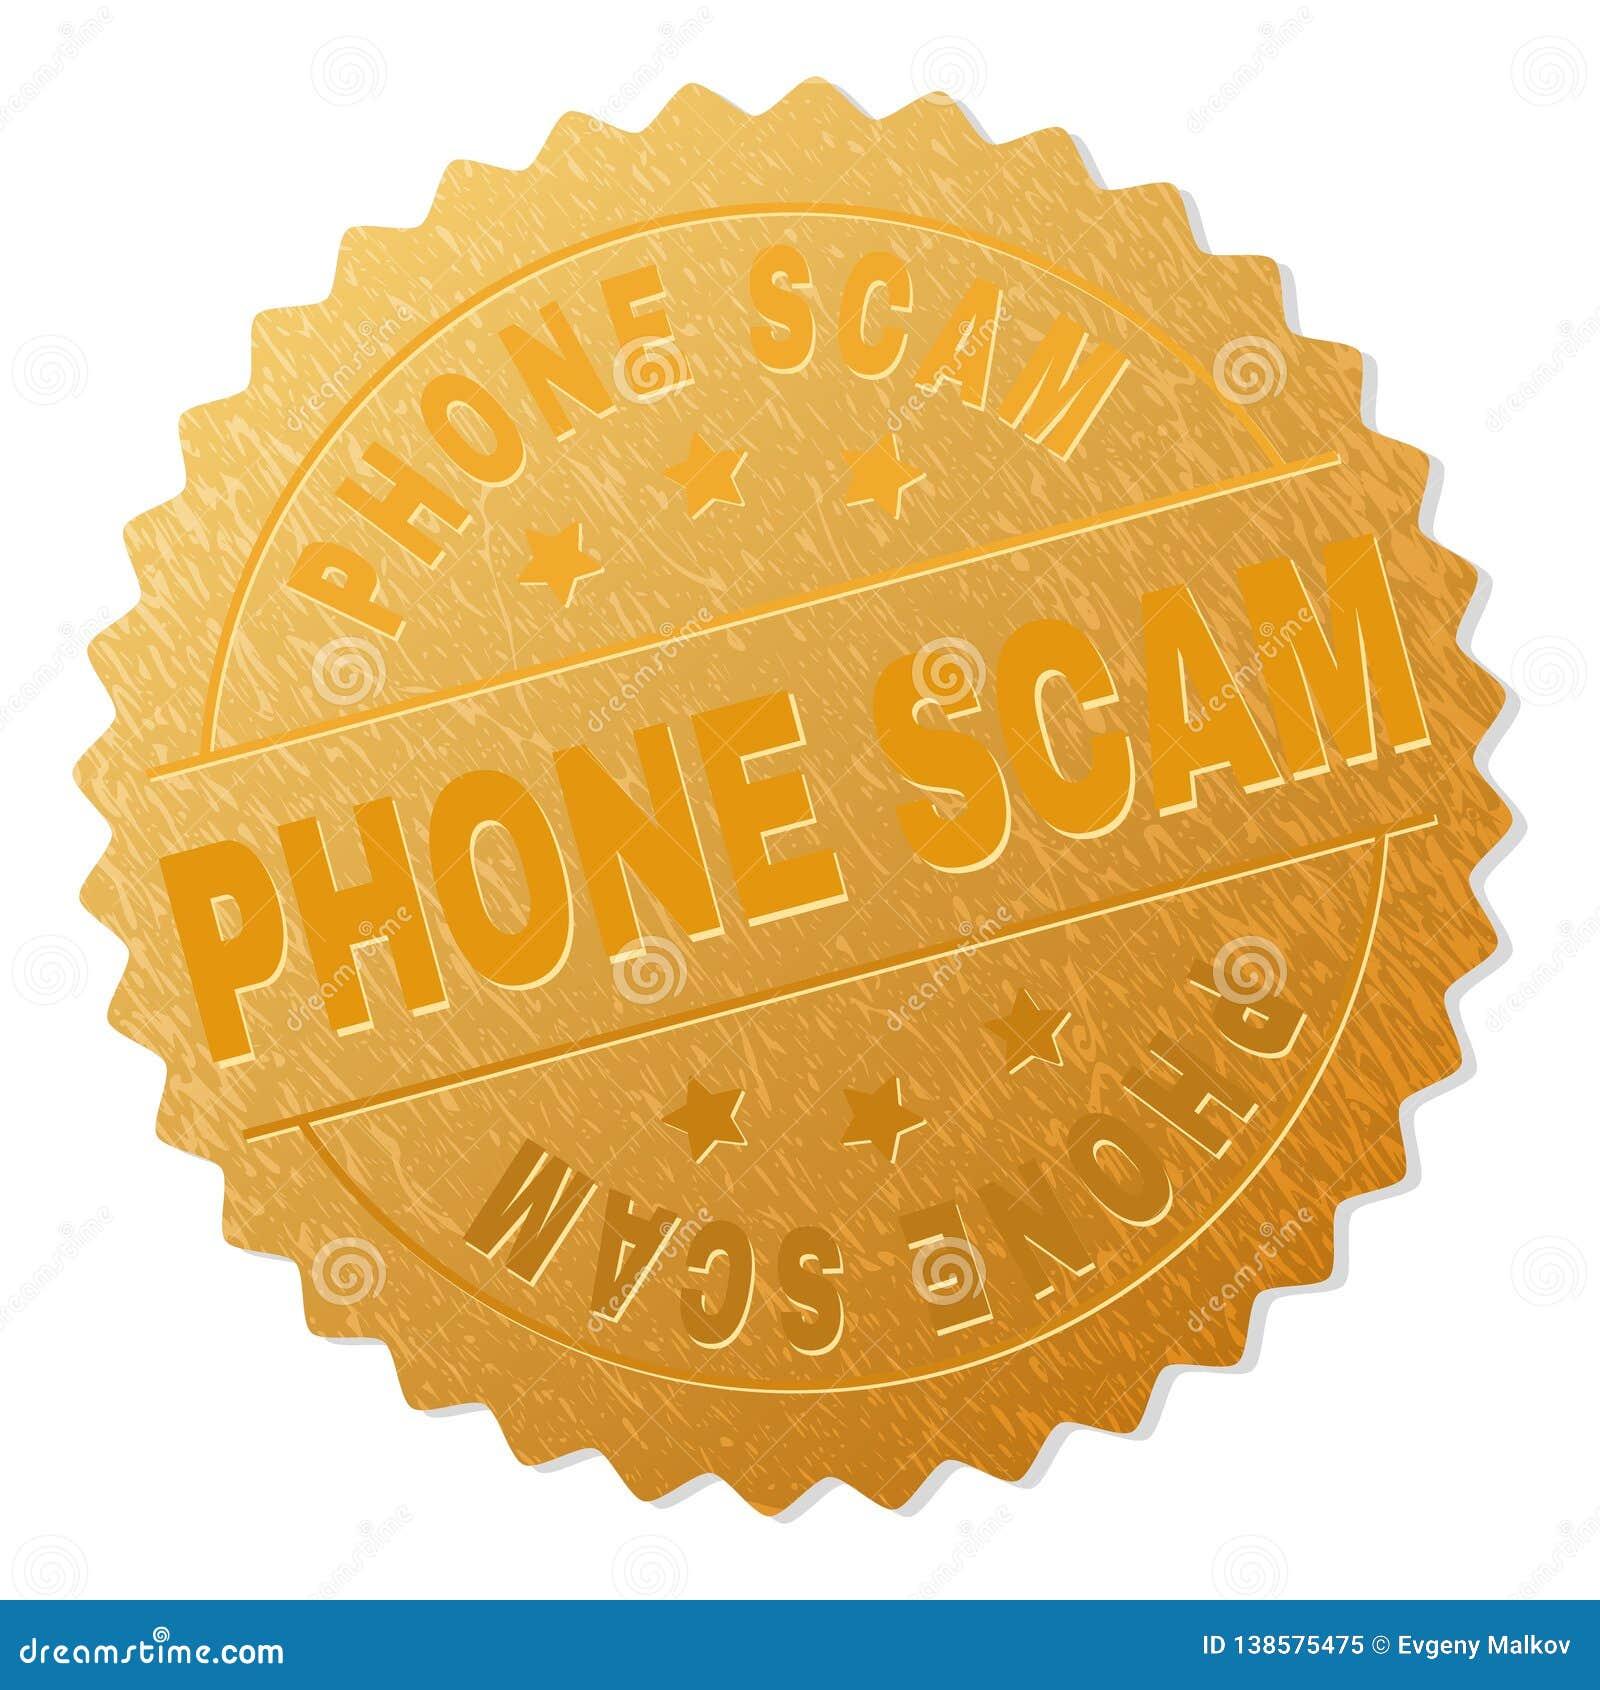 Gold PHONE SCAM Badge Stamp